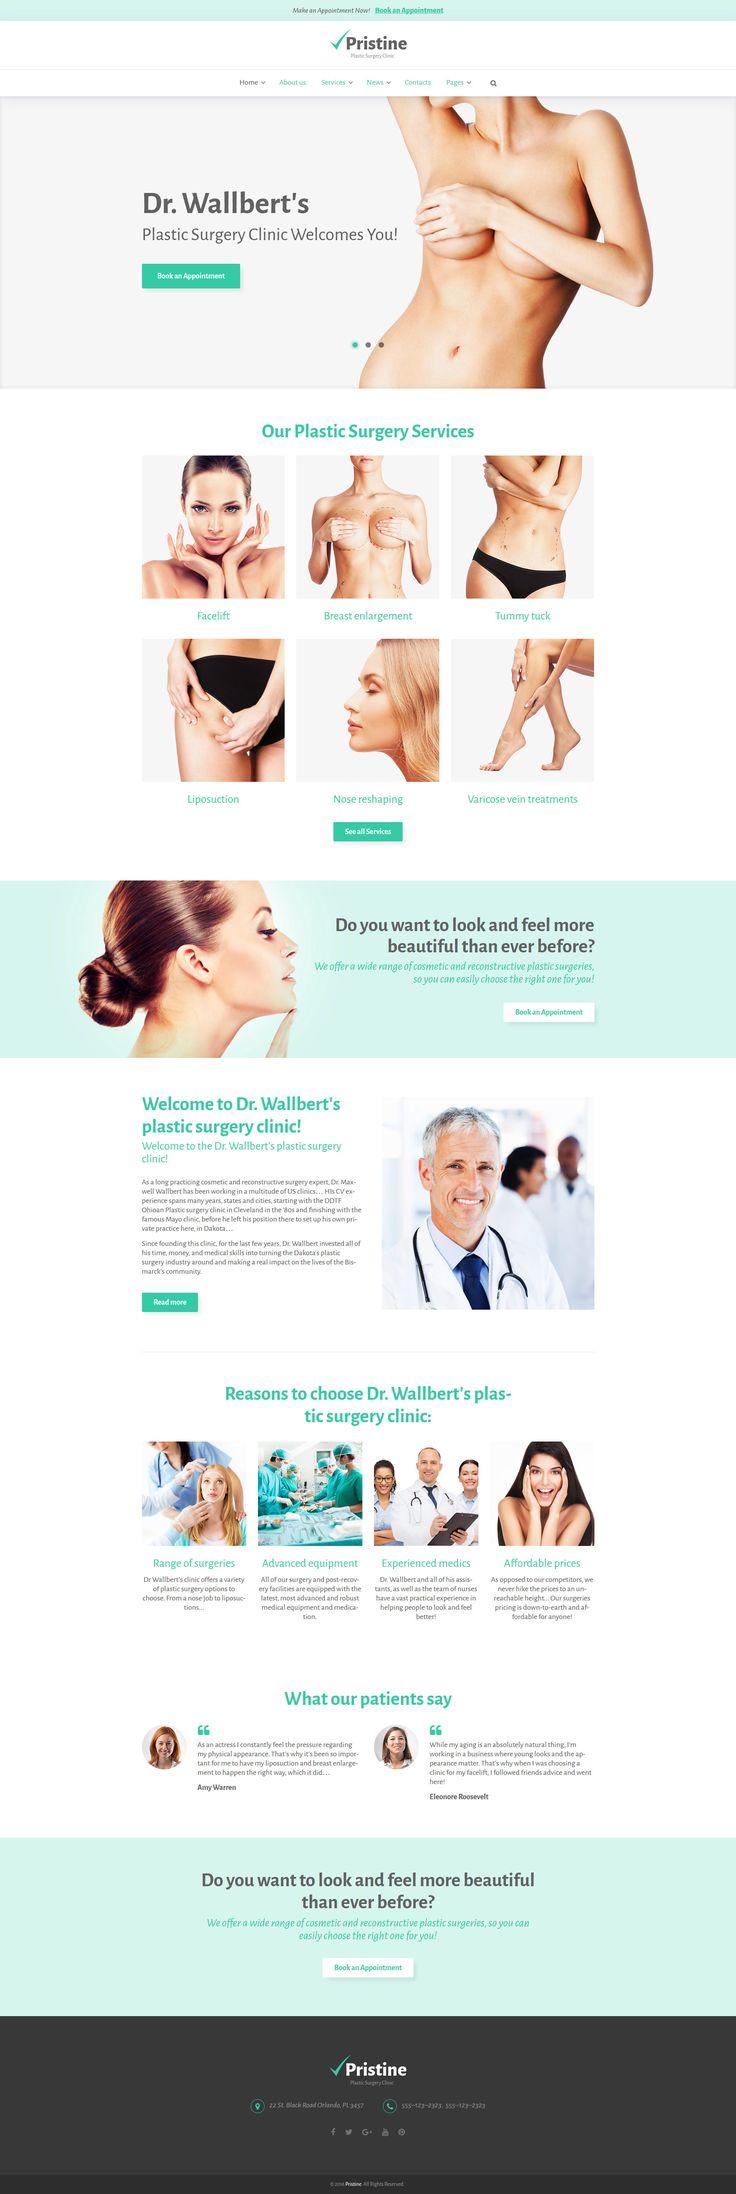 Plastic Surgery WordPress Theme http://www.templatemonster.com/wordpress-themes/pristine-wordpress-theme-58987.html #medicine